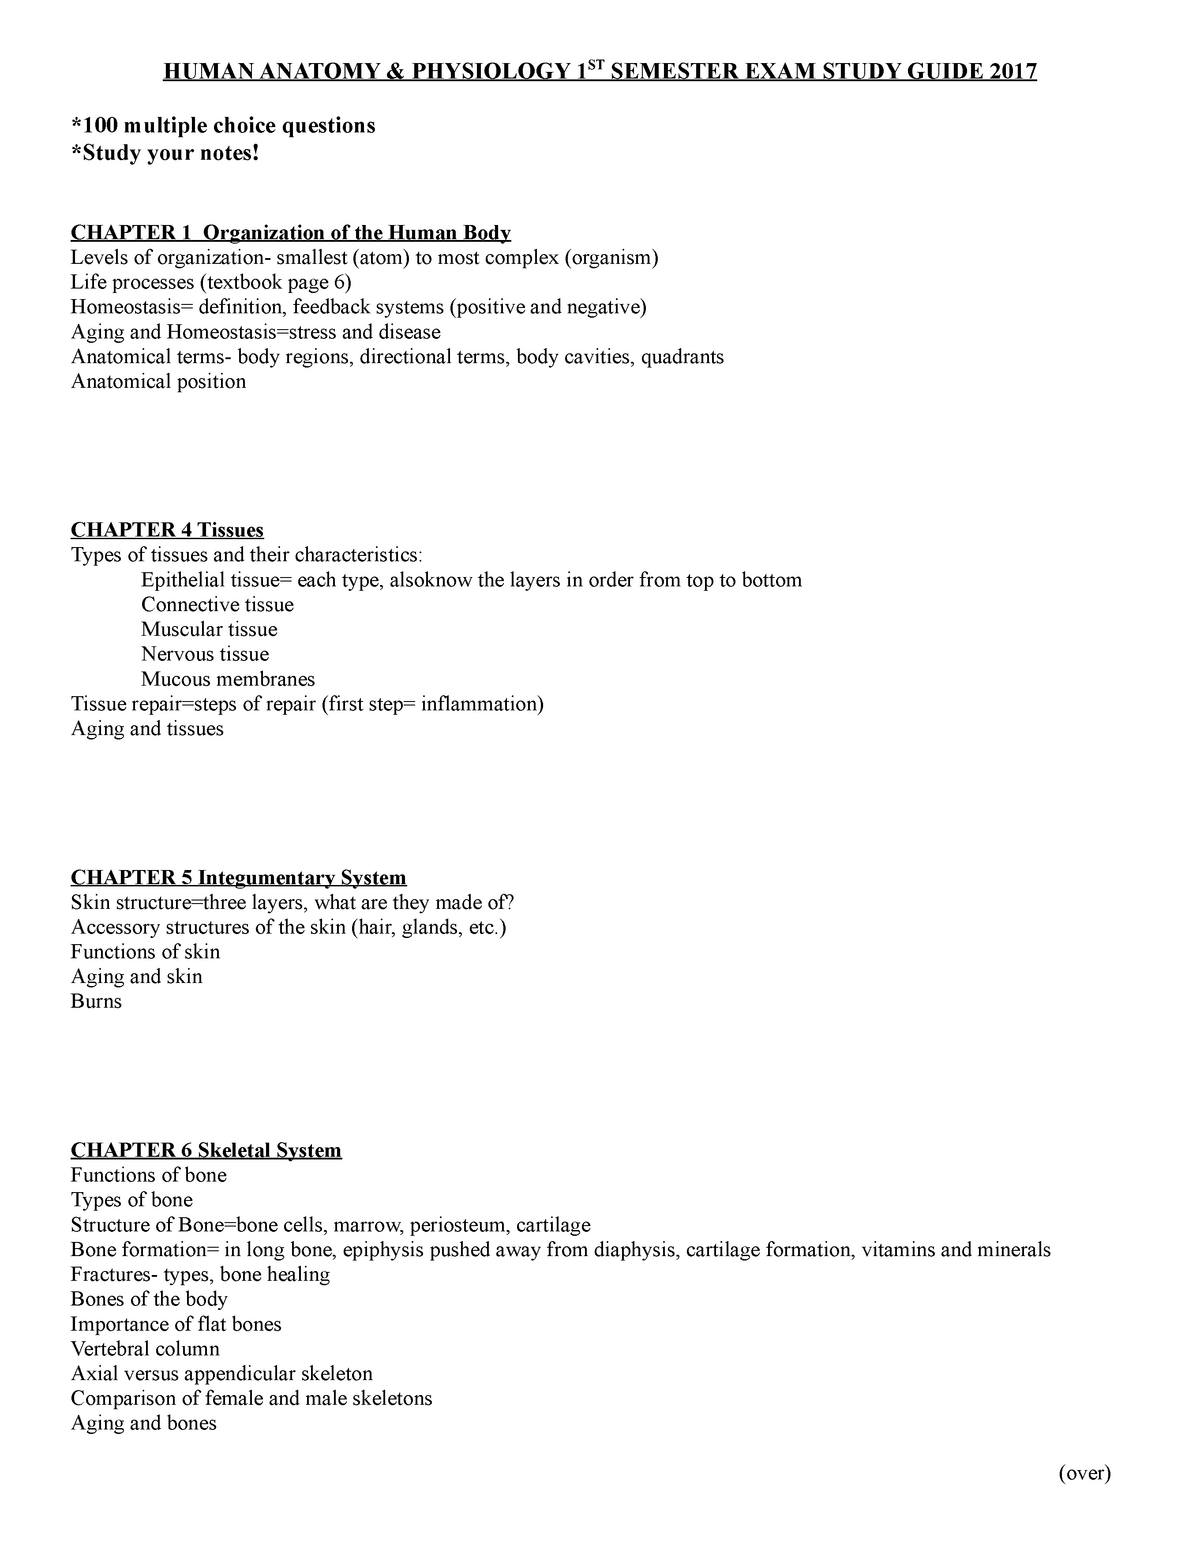 Human Anatomy Exam 1 Study Guide - BMS 6123 : Human Anatomy